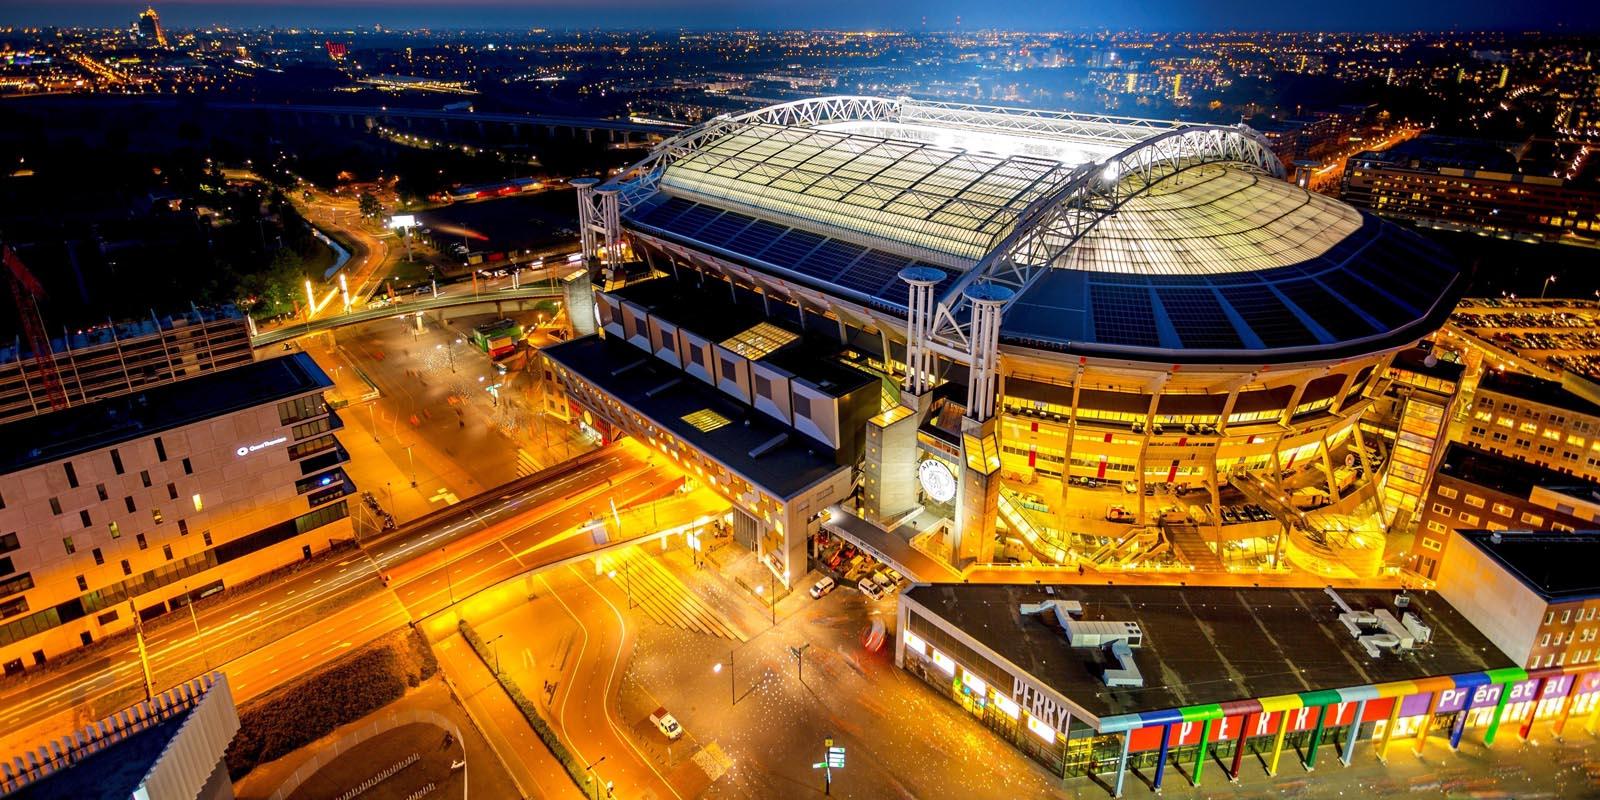 Photo of Το μεγαλύτερο σύστημα αποθήκευσης ενέργειας της Ευρώπης,  στο στάδιο Johan Cruijff Arena.